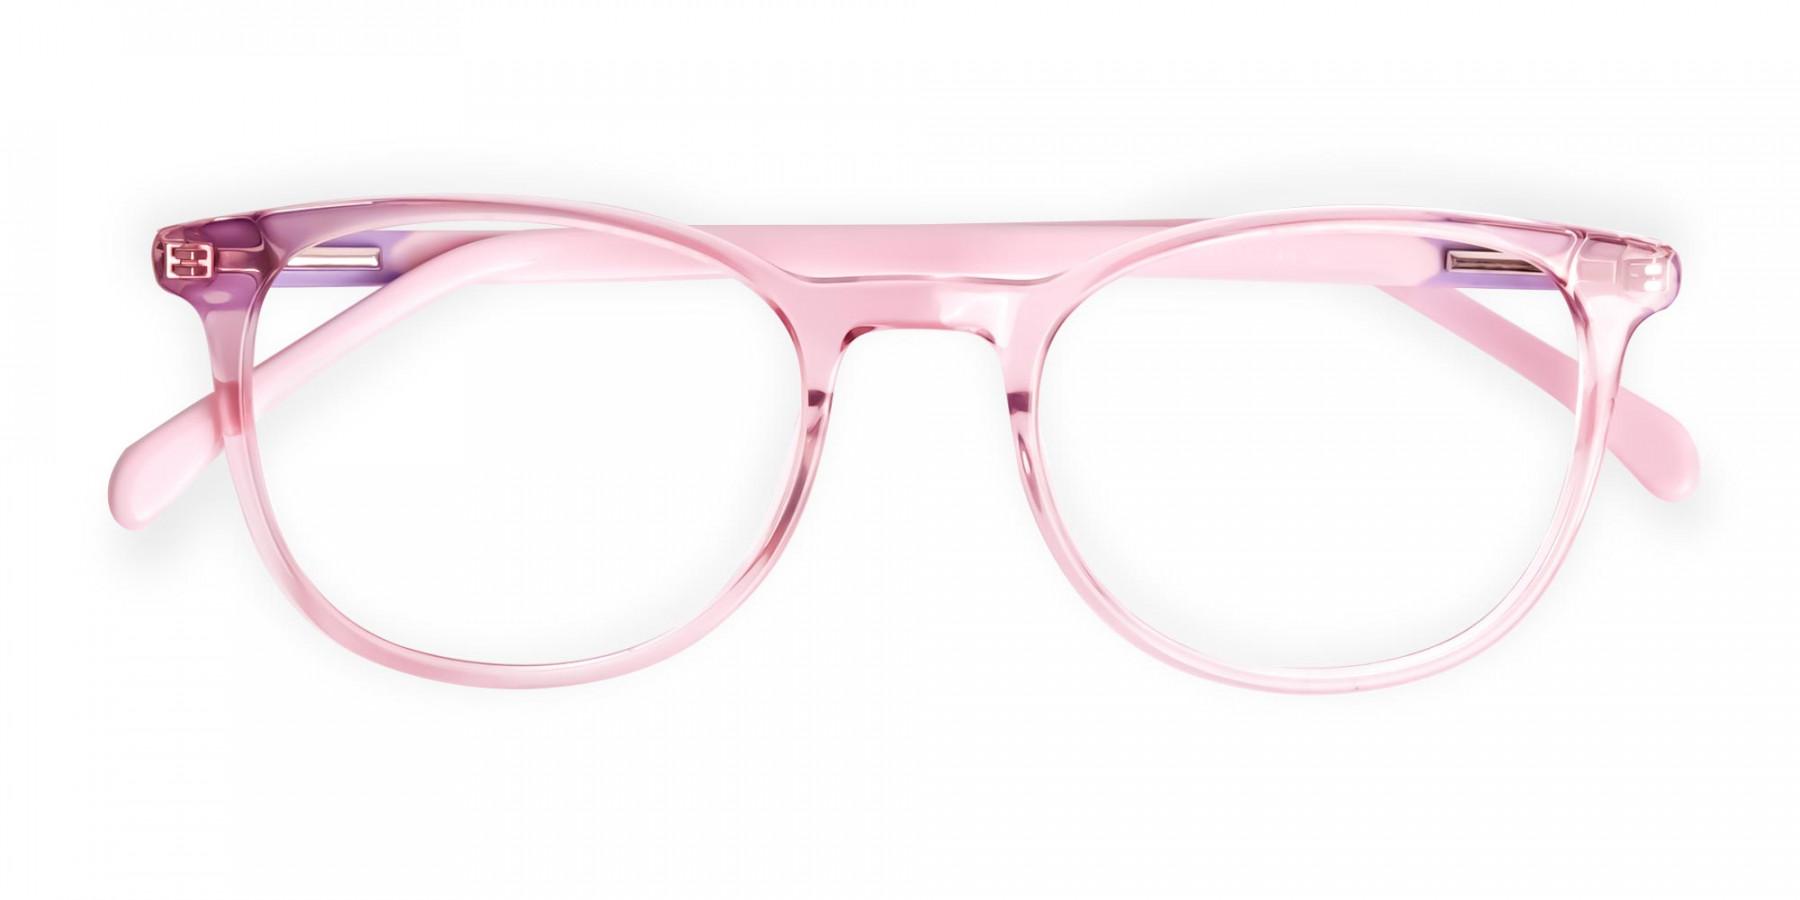 Crystal-and-transparent-blossom-Pink-Round-Glasses-Frames-1